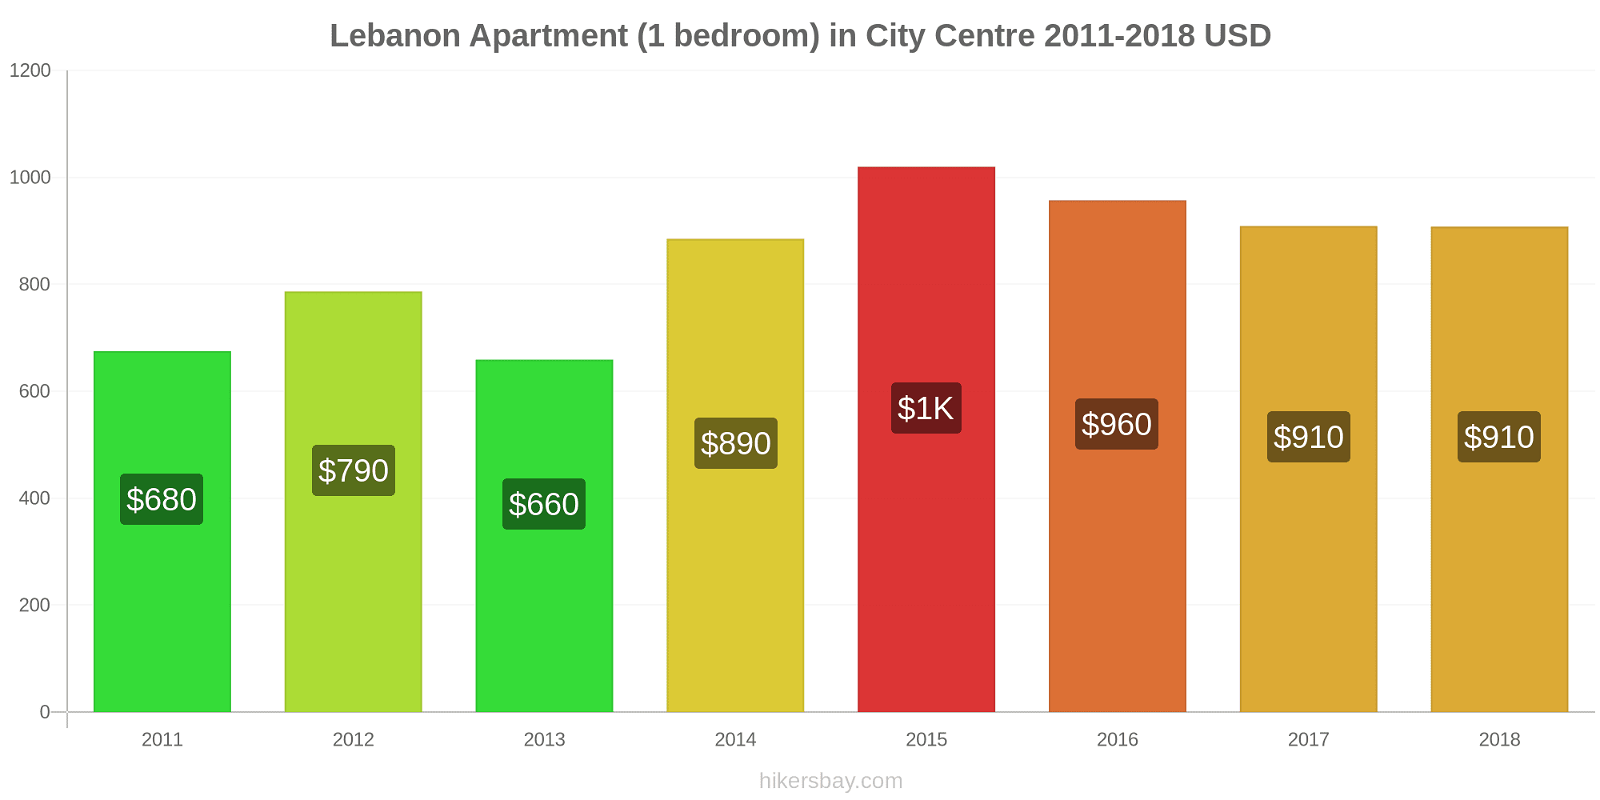 Lebanon price changes Apartment (1 bedroom) in City Centre hikersbay.com